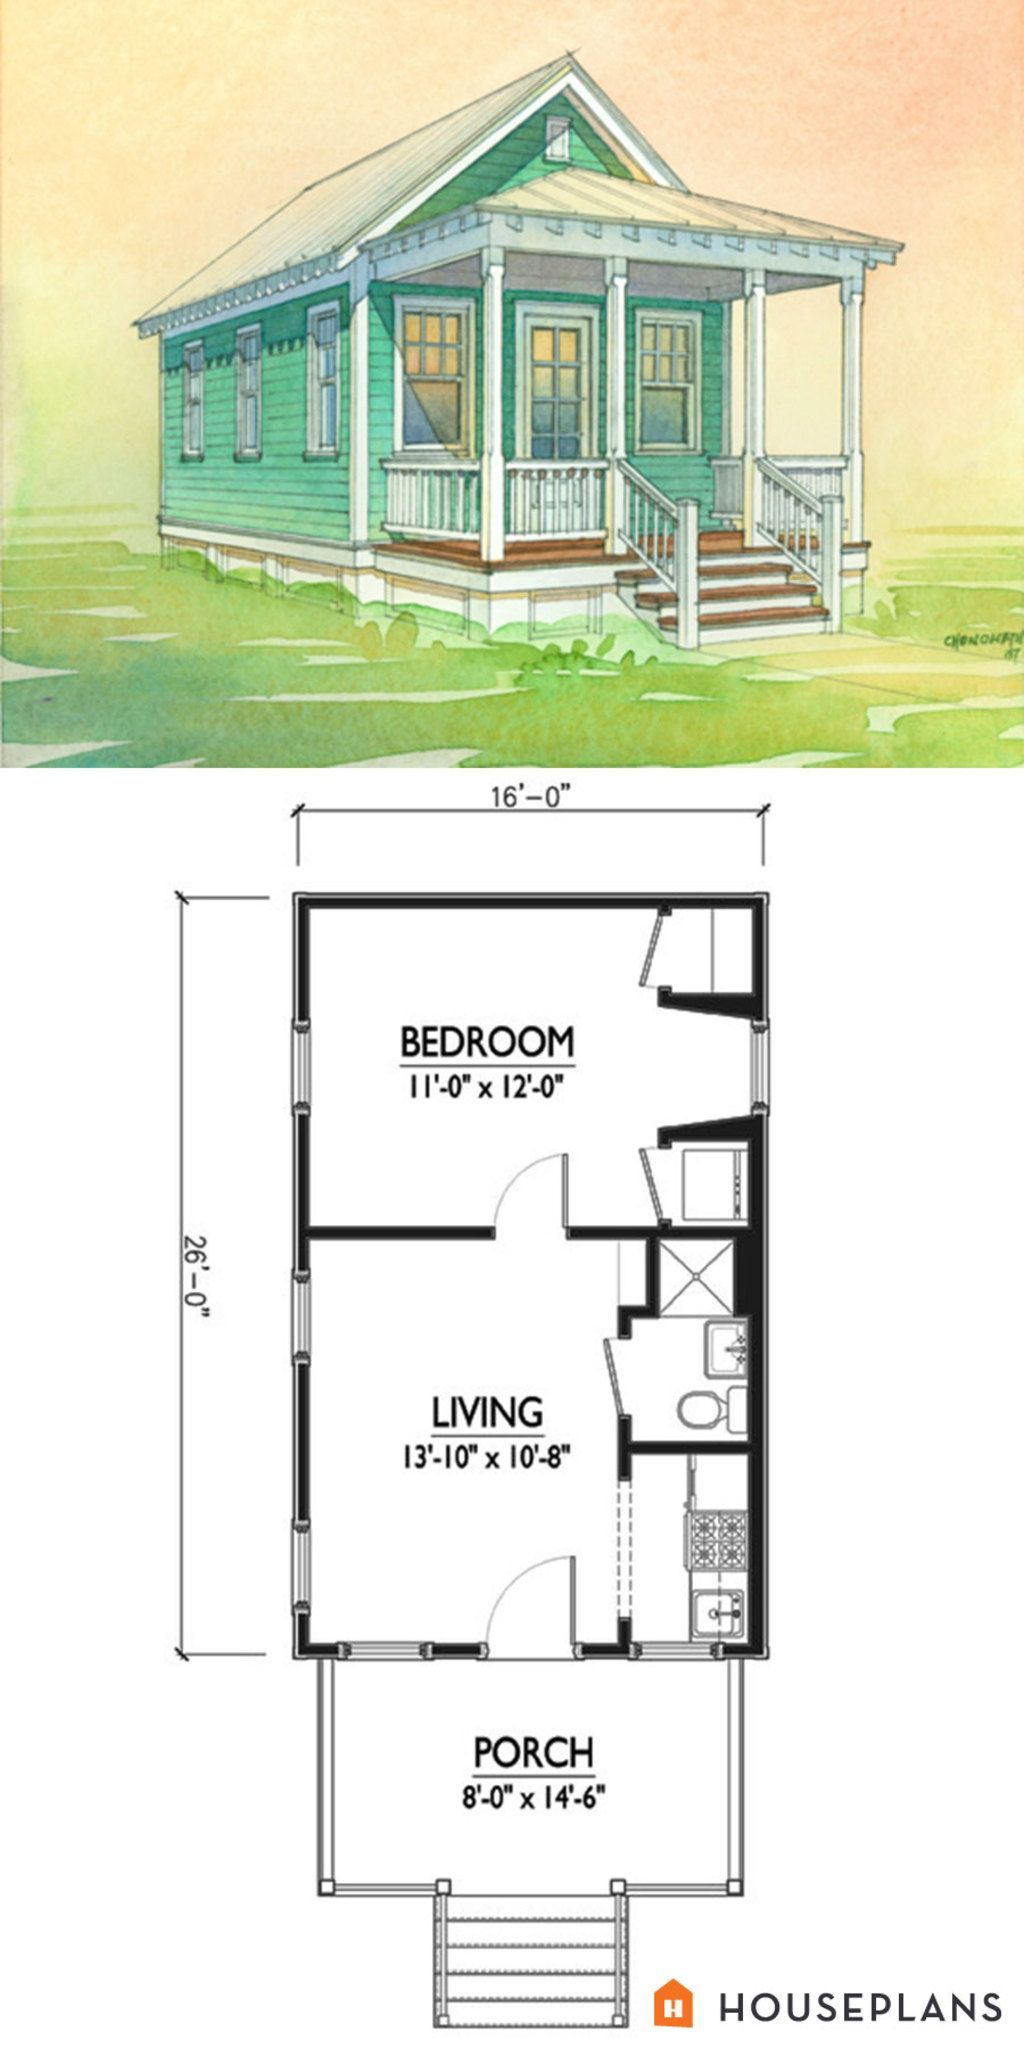 Charming Cottage House Plan By Marainne Cusato Houseplans Plan No 514 2 Tinyhouseplans Tiny House Floor Plans Cottage Style House Plans Cottage House Plans